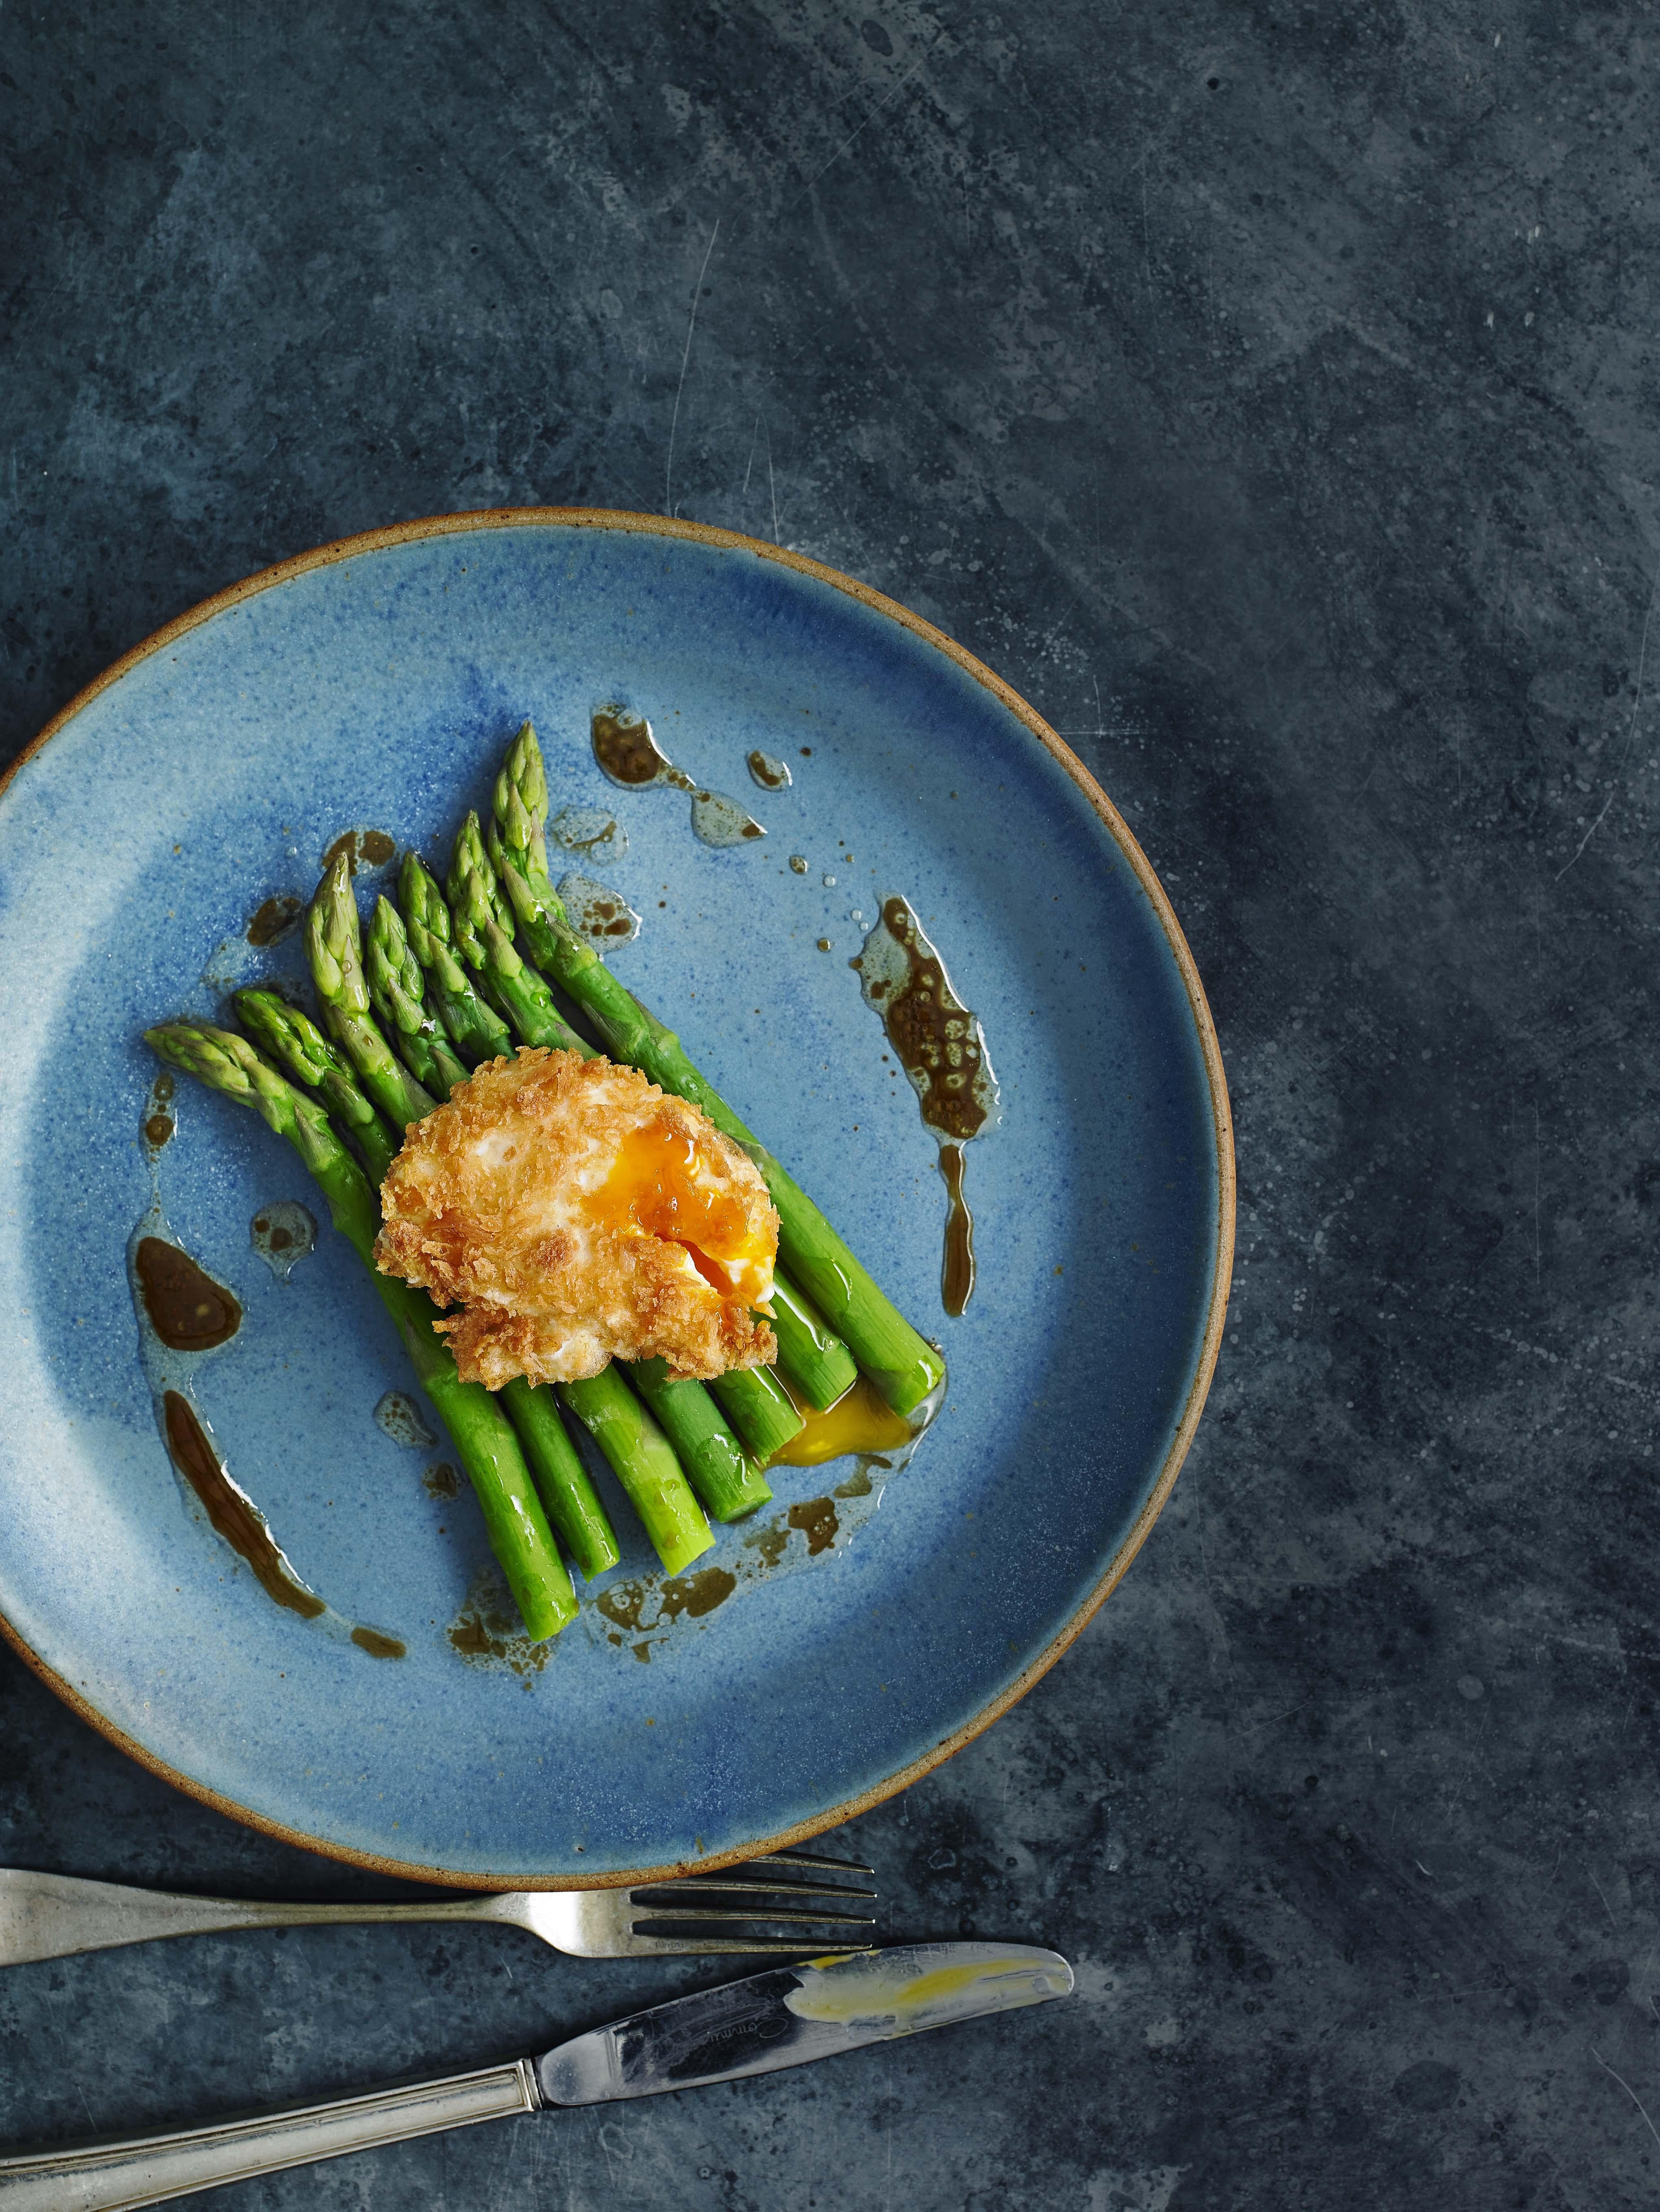 Schnitzel, eggs and asparagus